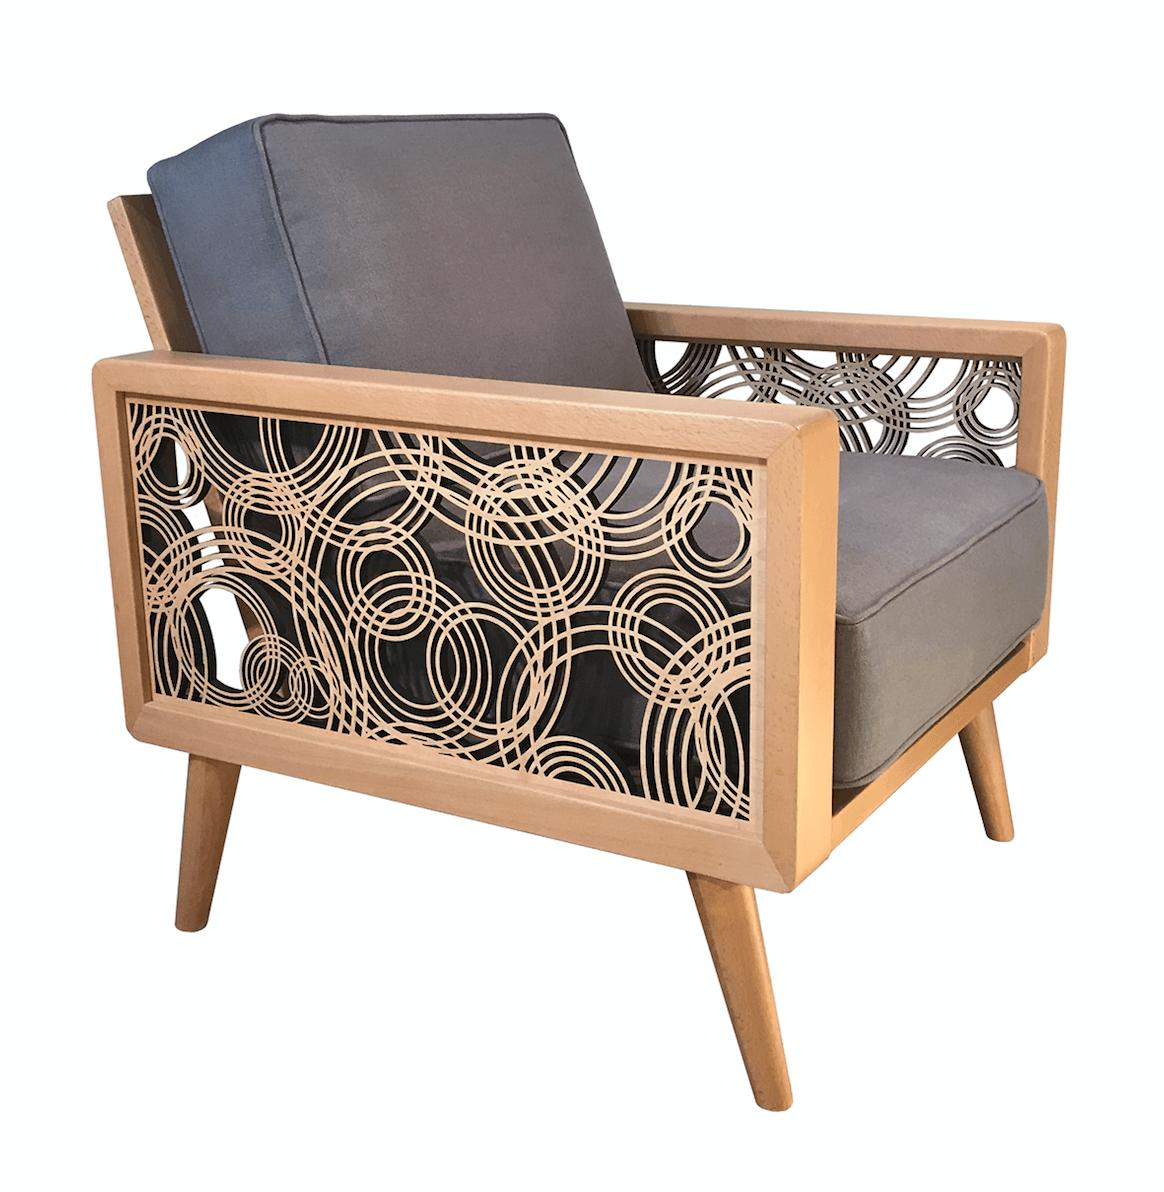 Cool Rain On Water Mid Century Modern Lounge Chair Natural Gray Inzonedesignstudio Interior Chair Design Inzonedesignstudiocom